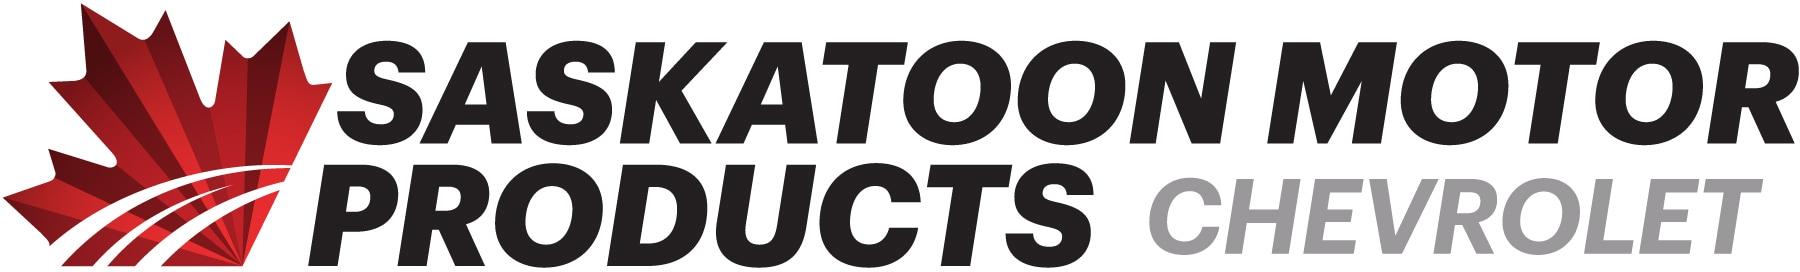 Saskatoon Motor Products logo